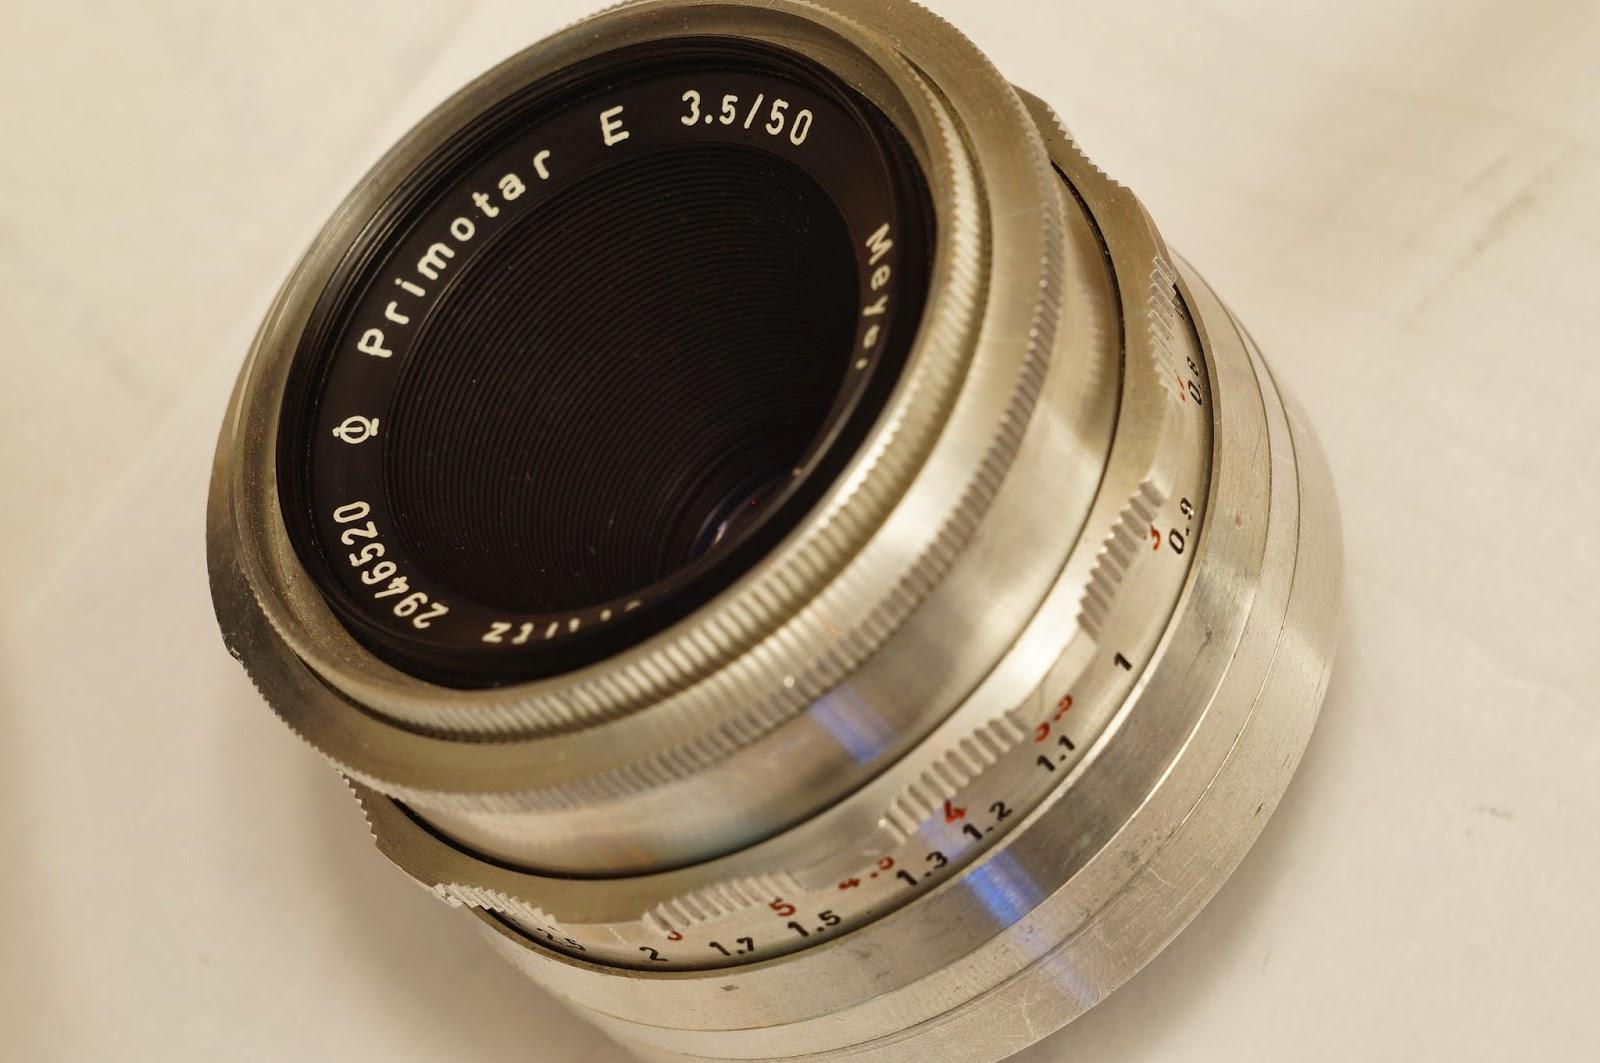 Meyer-Optik Görlitz Primotar E 3.5/50 sample